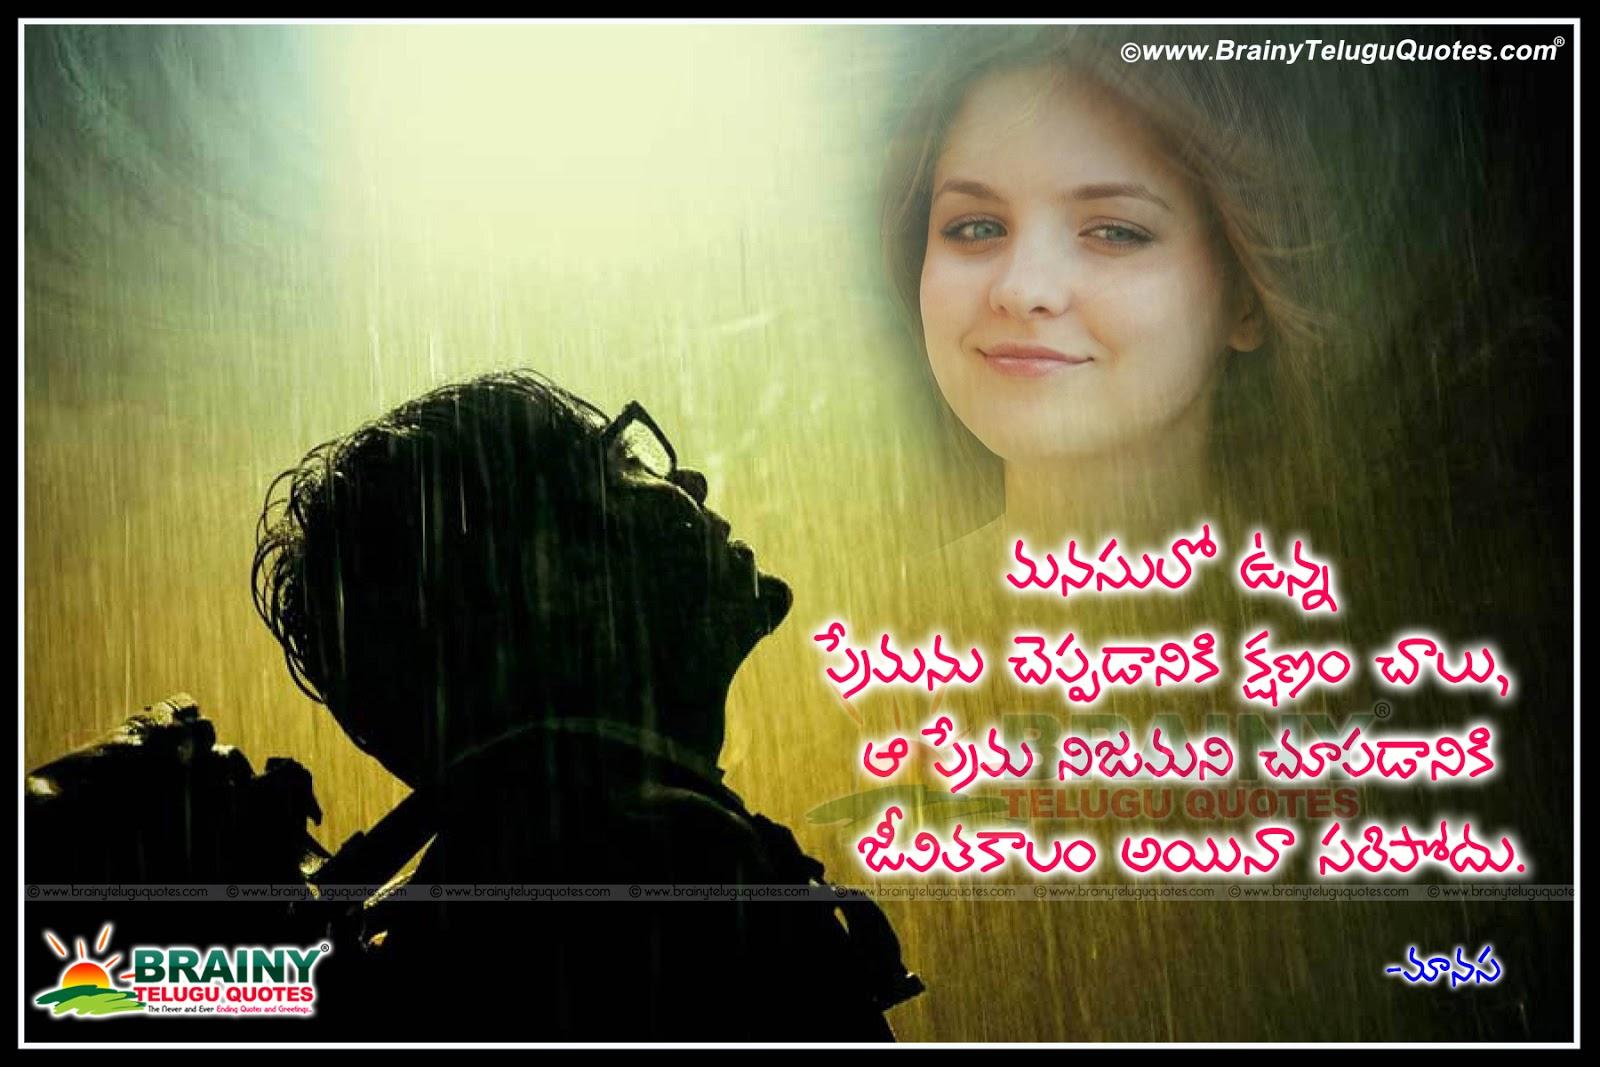 Telugu Latest Love Failure Prema Kavithalu With Alone - Love Failure Quotes Hd Images In Telugu - HD Wallpaper